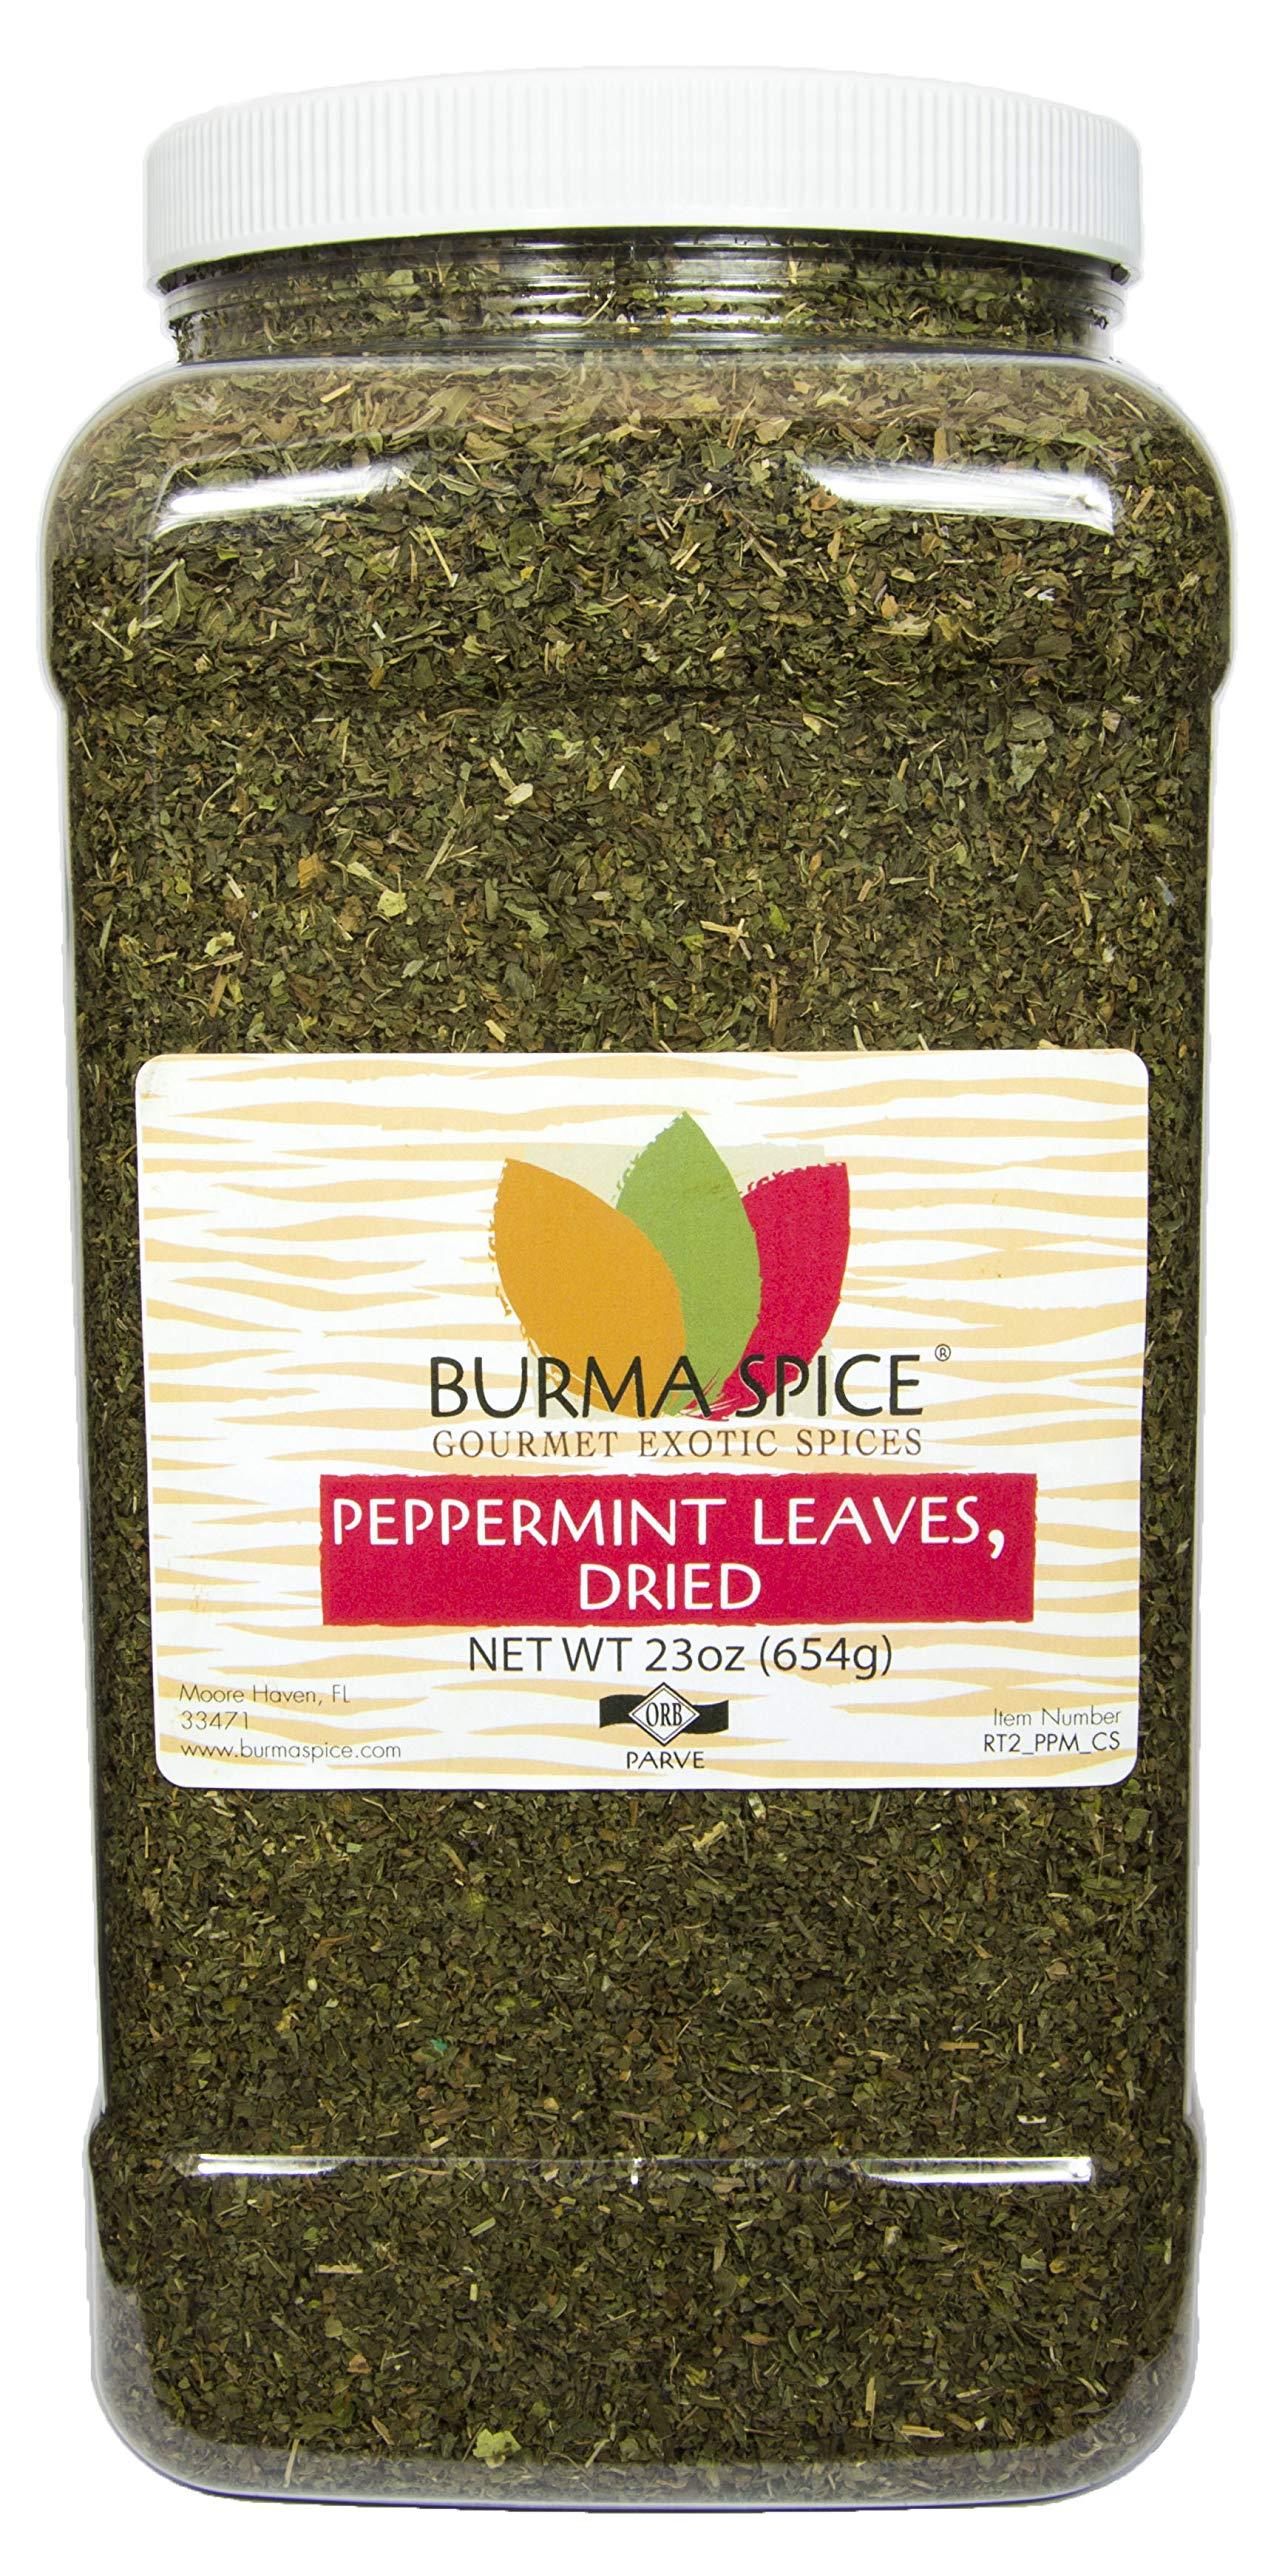 Peppermint Leaves : Dried Herb Loose Leaf Mint Tea : Caffeine-Free Kosher (23oz.) by Burma Spice (Image #1)